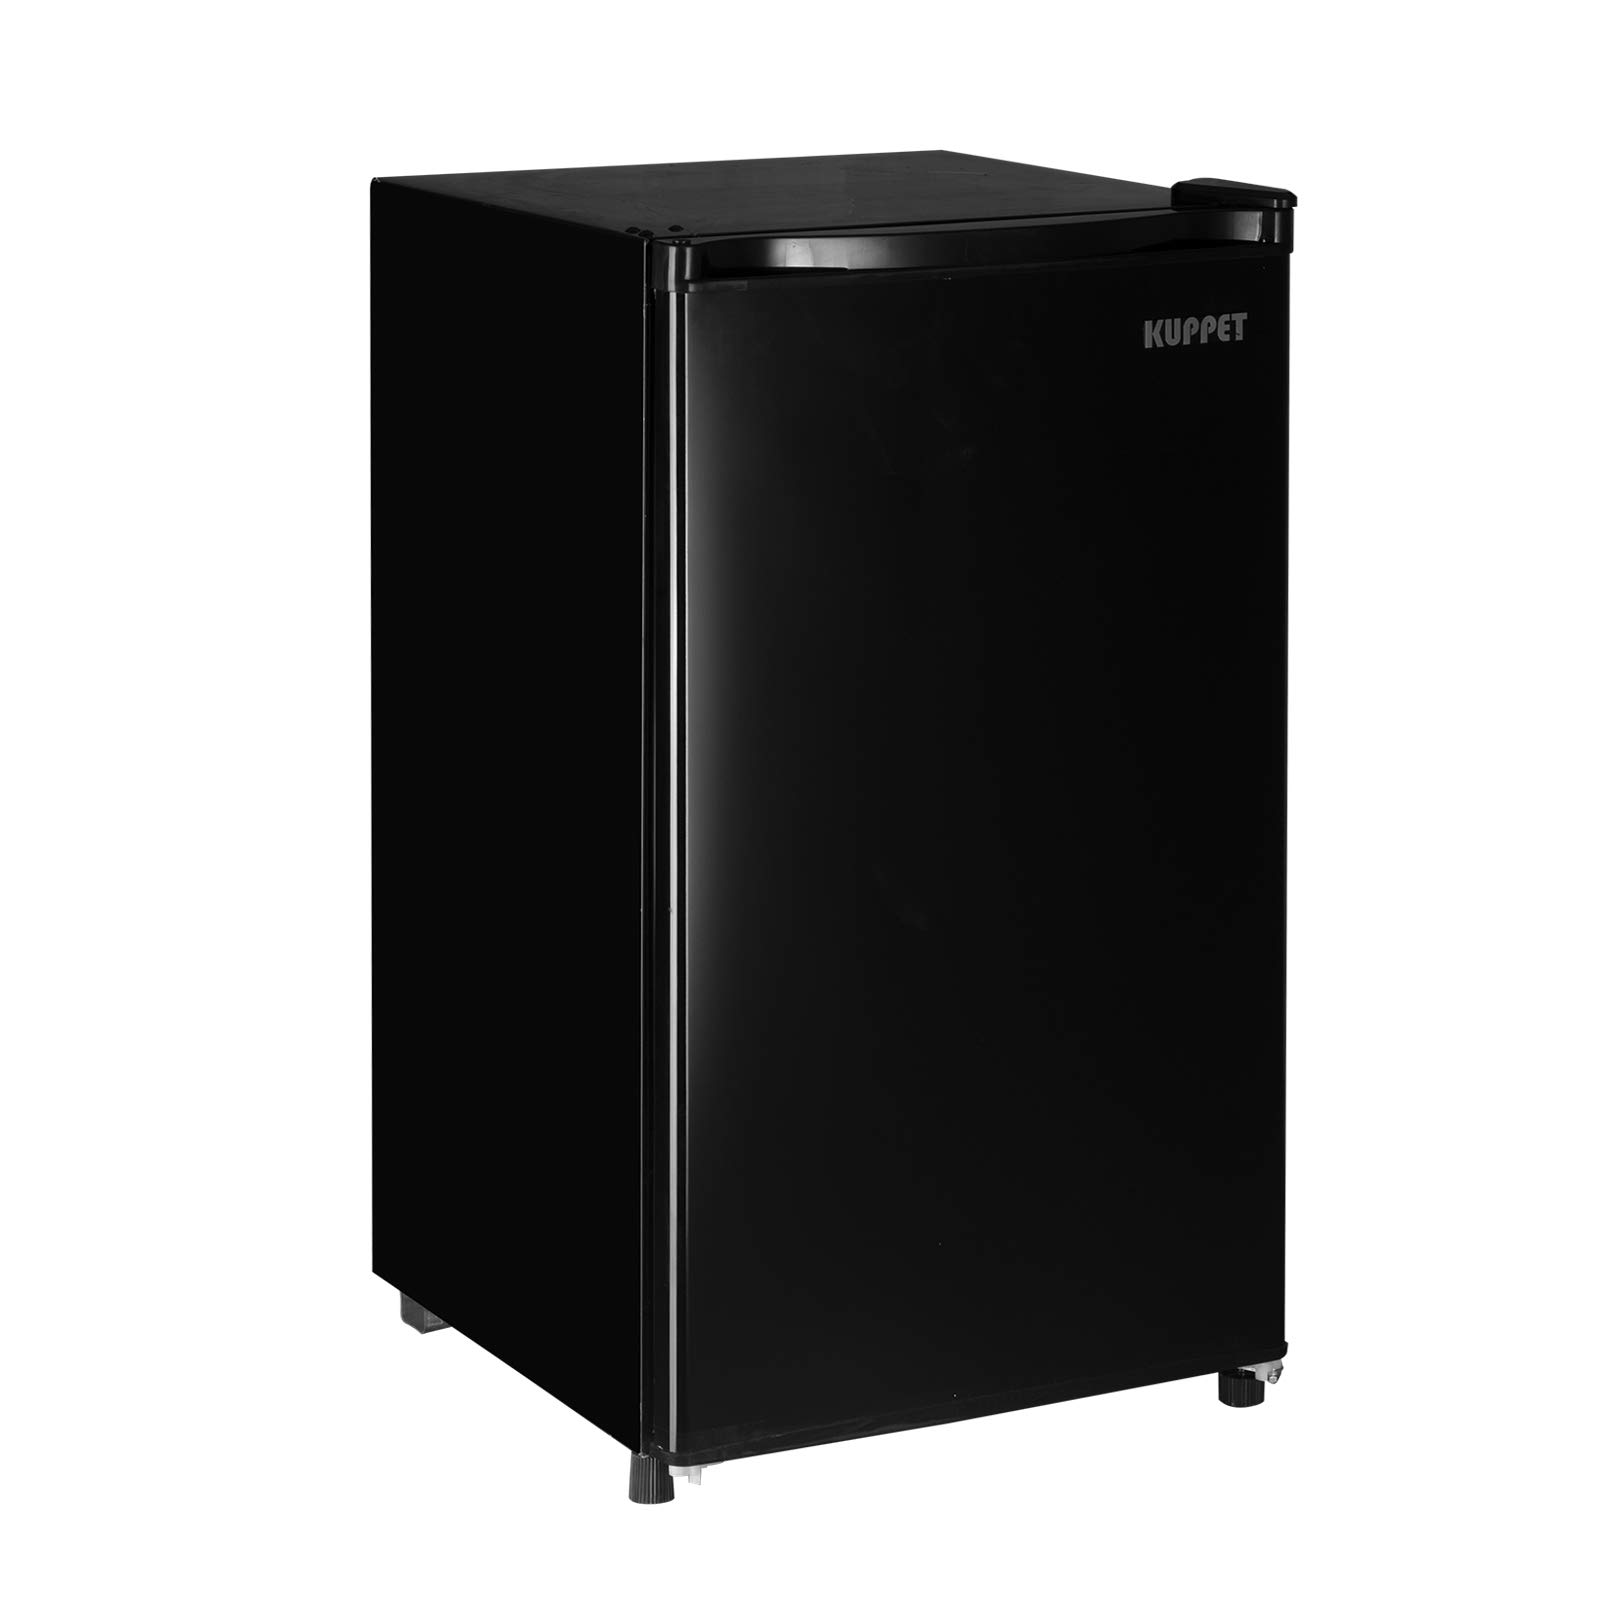 Kuppet Mini Fridge Compact Refrigerator for Dorm, Garage, Camper, Basement or Office, Single Door Mini Fridge, 3.2 Cu.Ft, Black